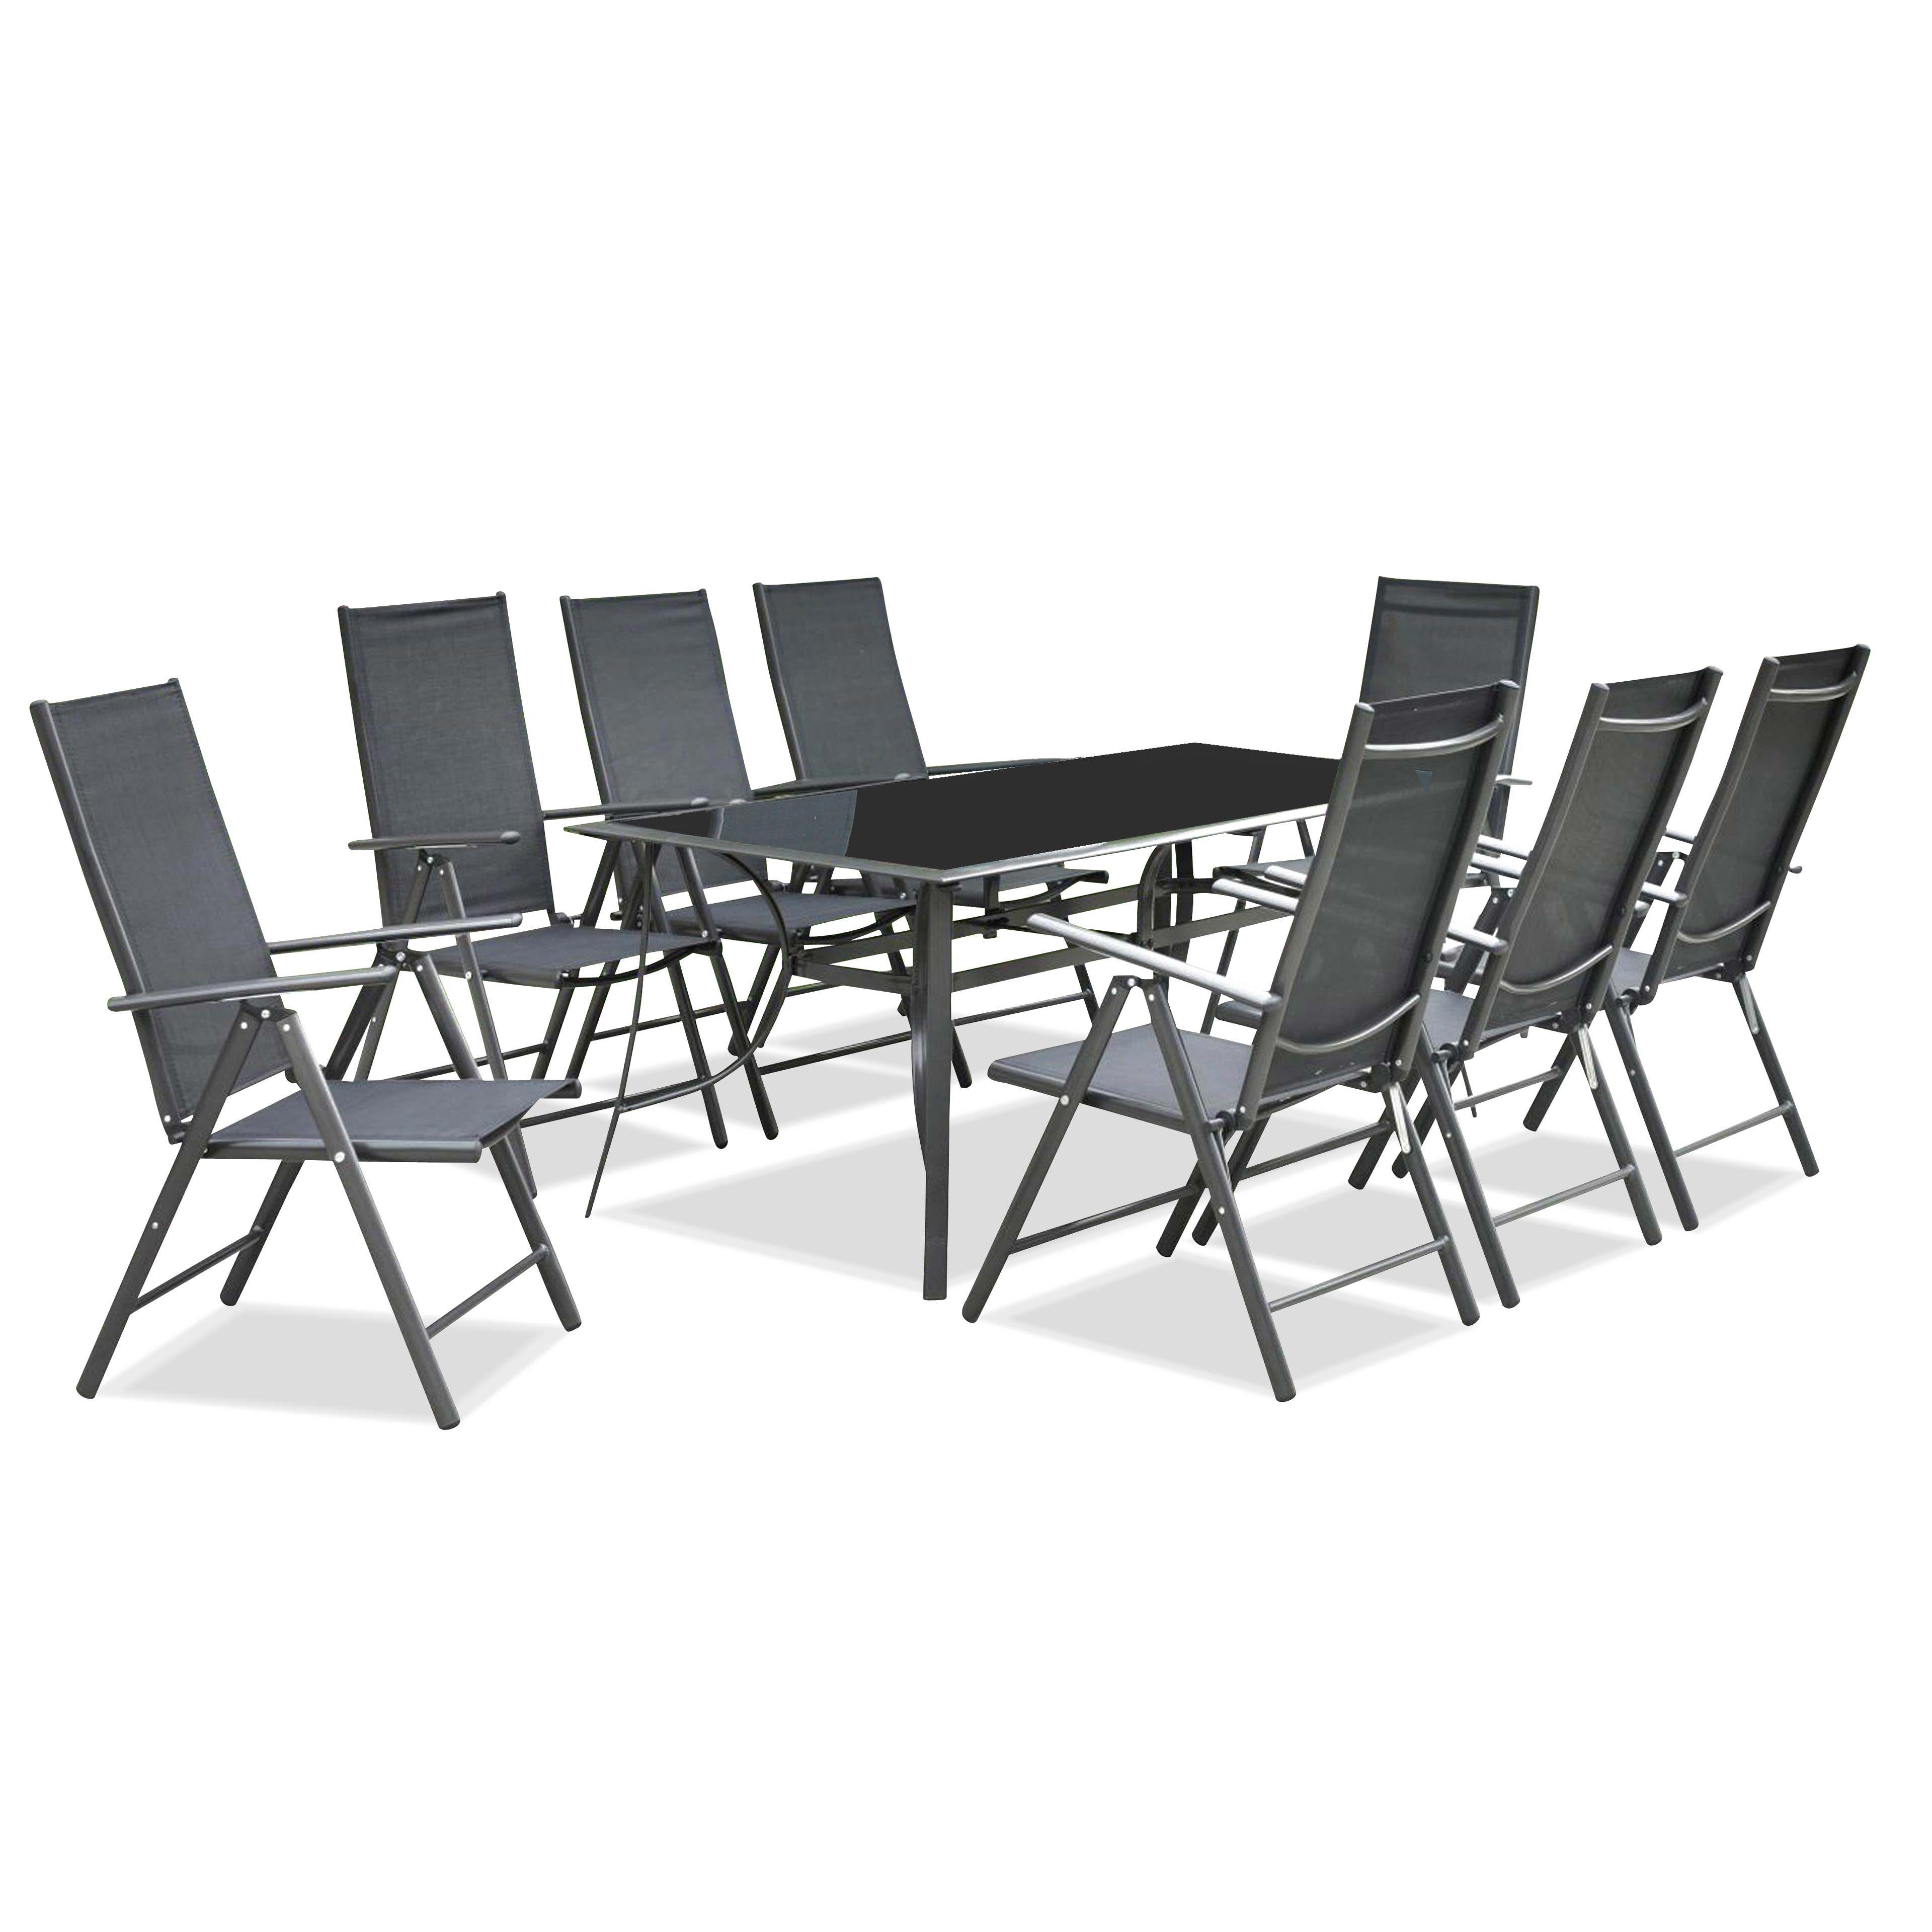 Salon de jardin aluminium et verre 8 personnes